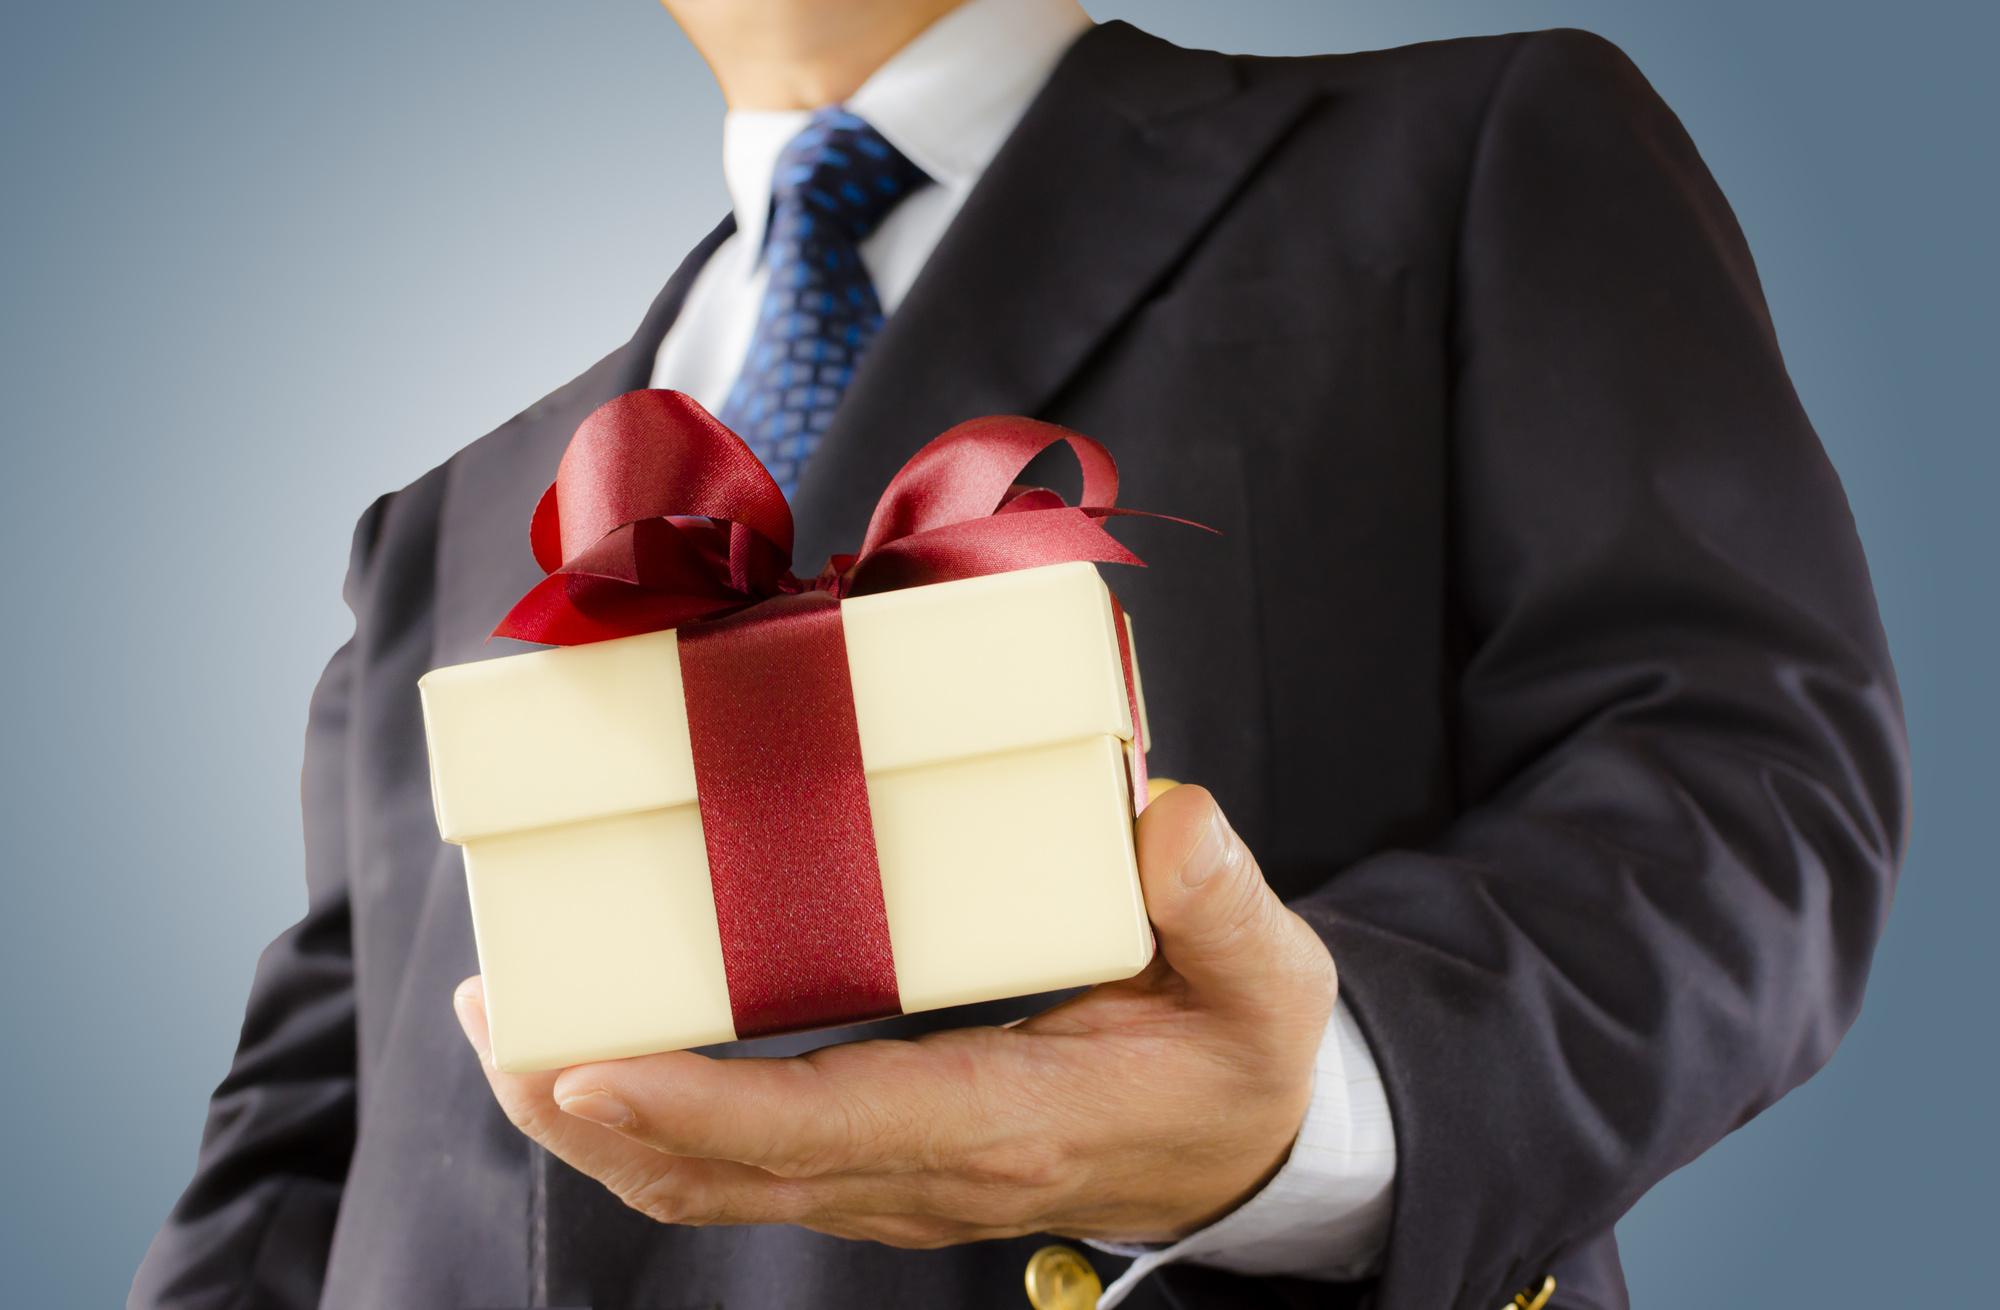 картинка мужчина с подарком в руках квиллинг